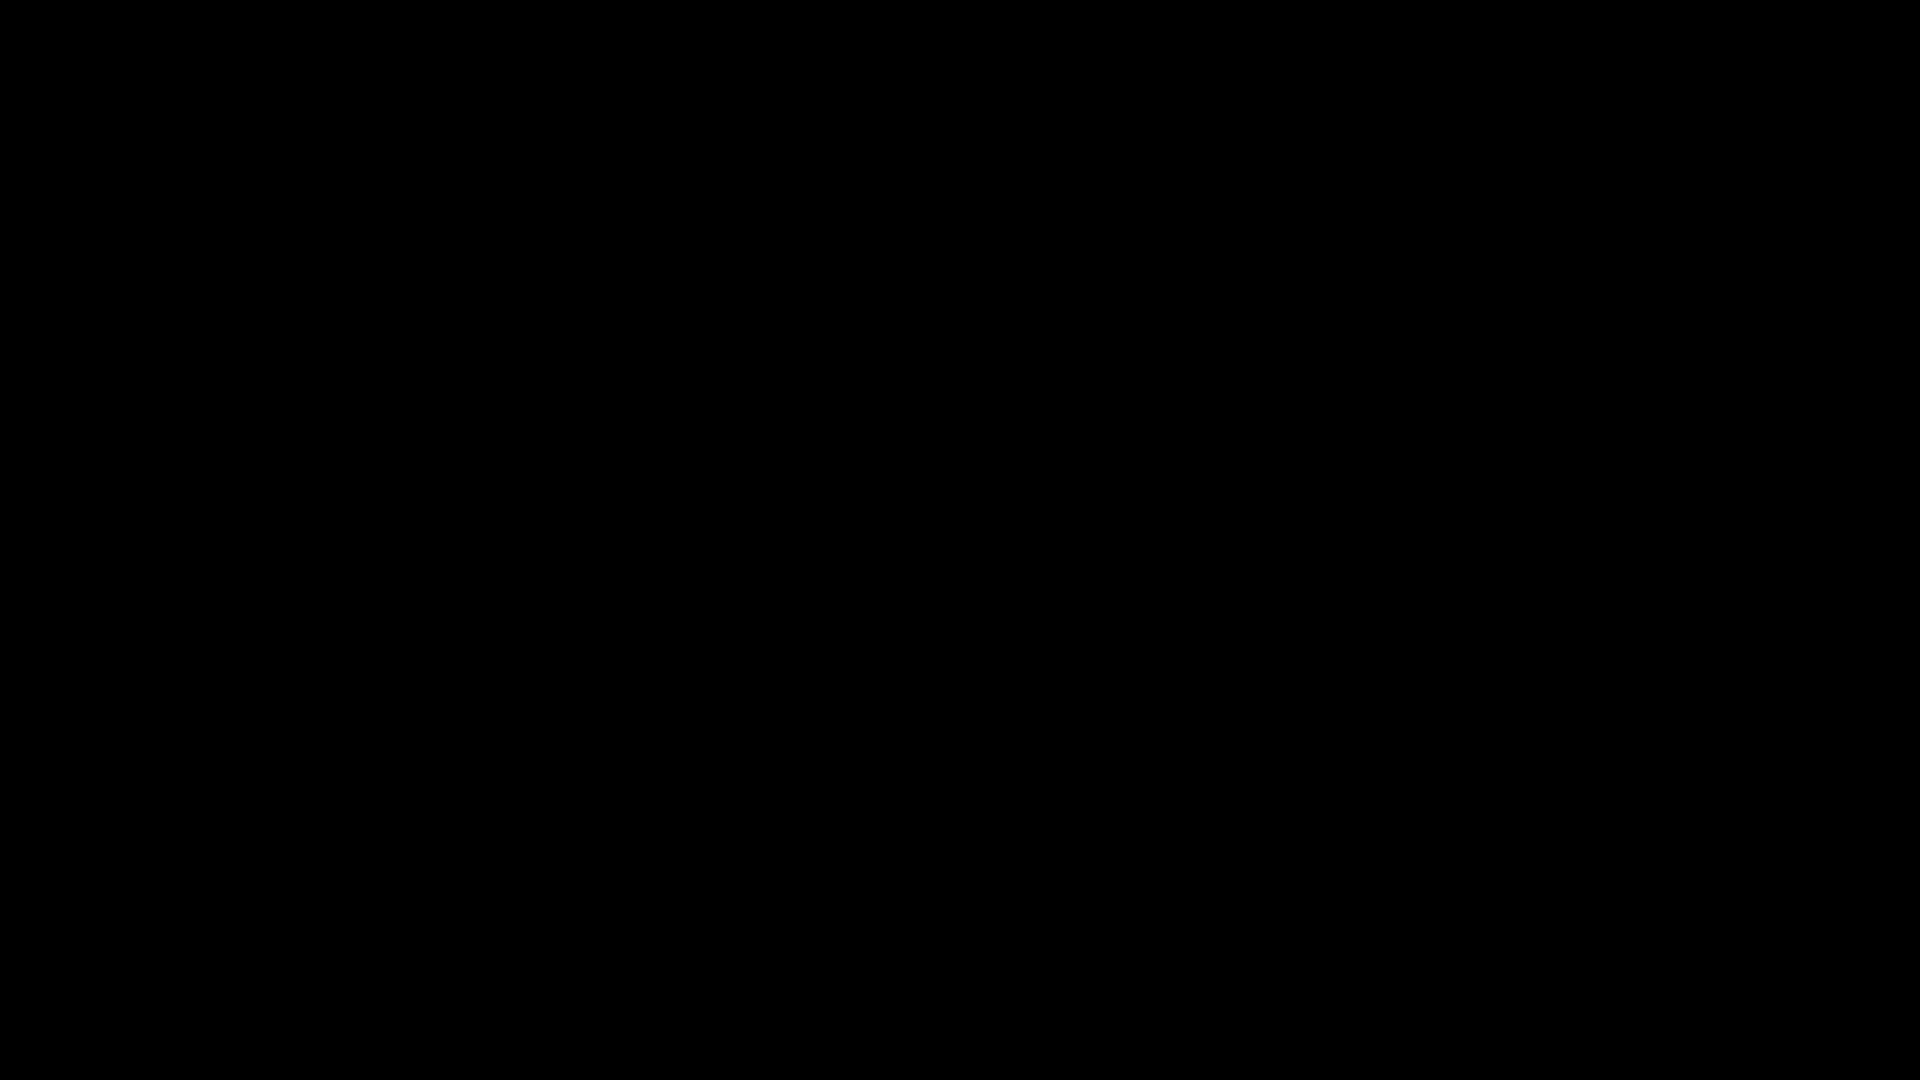 Action, Animation, Apex Legends, Battle Royal, Comedy, Crossover, D.va, Fight, Fortnite, Mei, Mercy, Overwatch, SFM, Source Film Maker, Source Filmmaker, Steam, TF2, Team Fortress 2, Valve, Verses, Overwatch vs. TF2: Episode 2 [SFM] GIFs